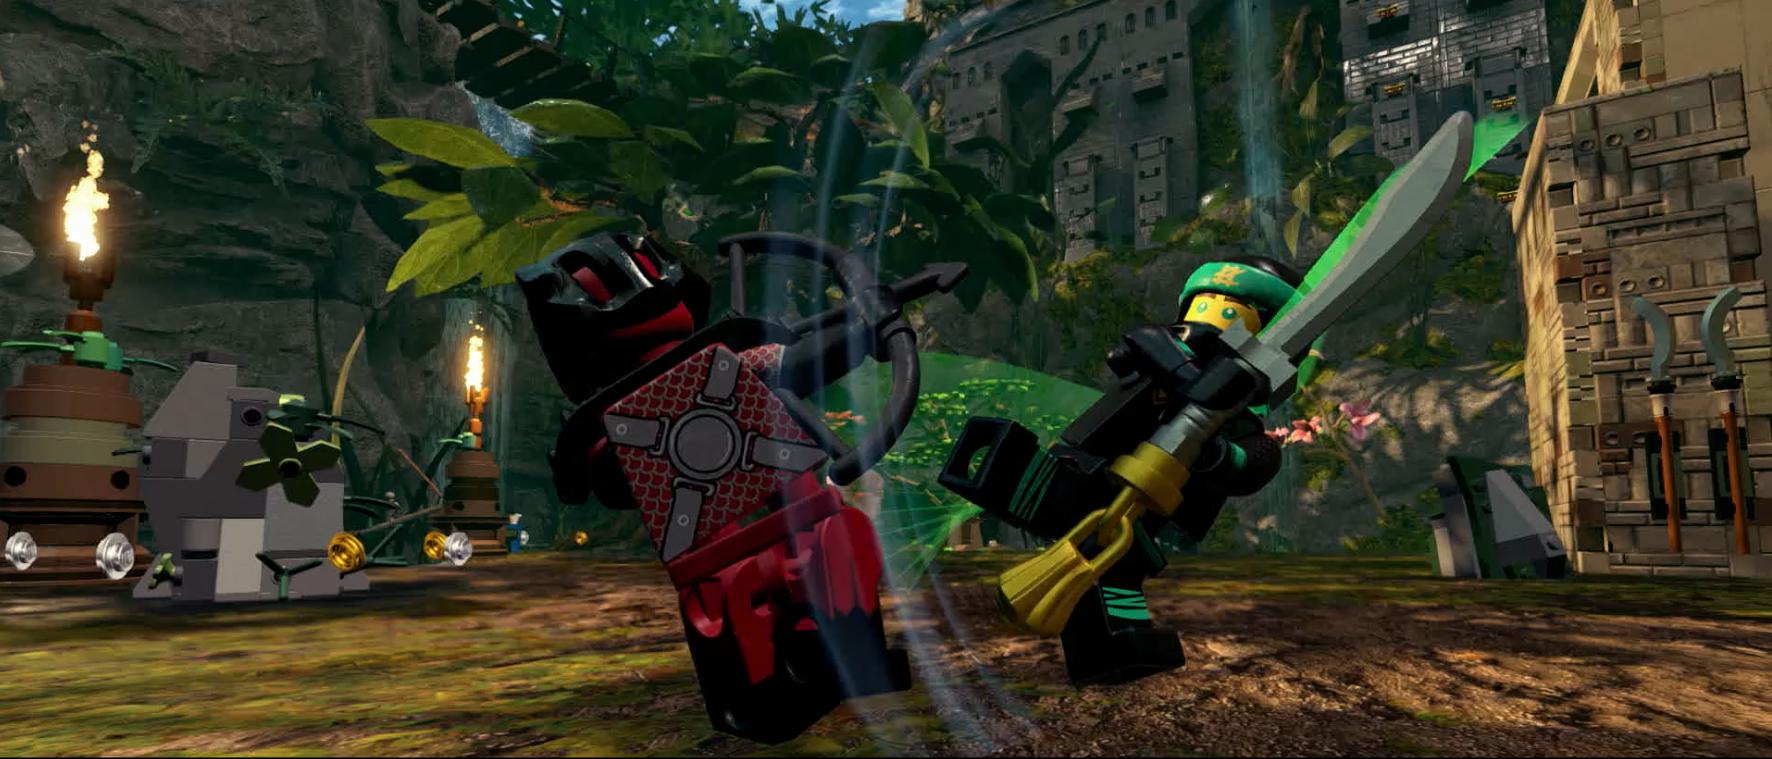 lego-ninjago-film-video-game-v1-529708.jpg